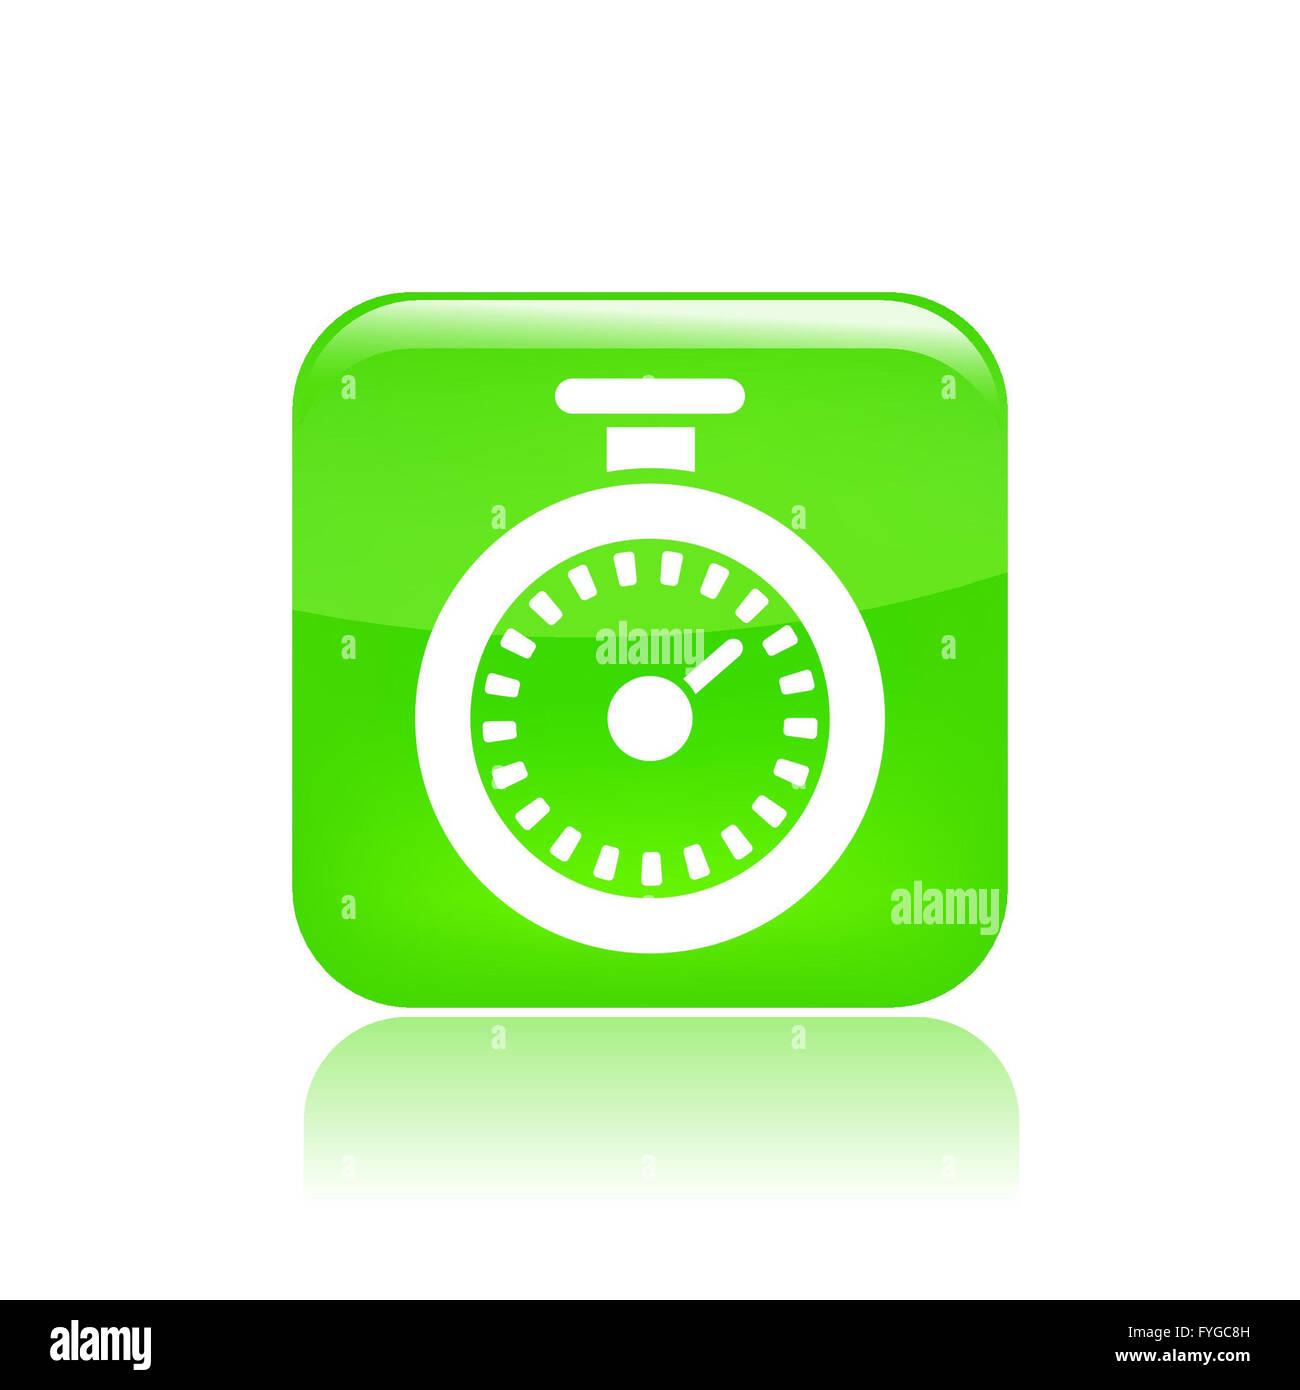 Vector illustration of chronometer icon - Stock Image